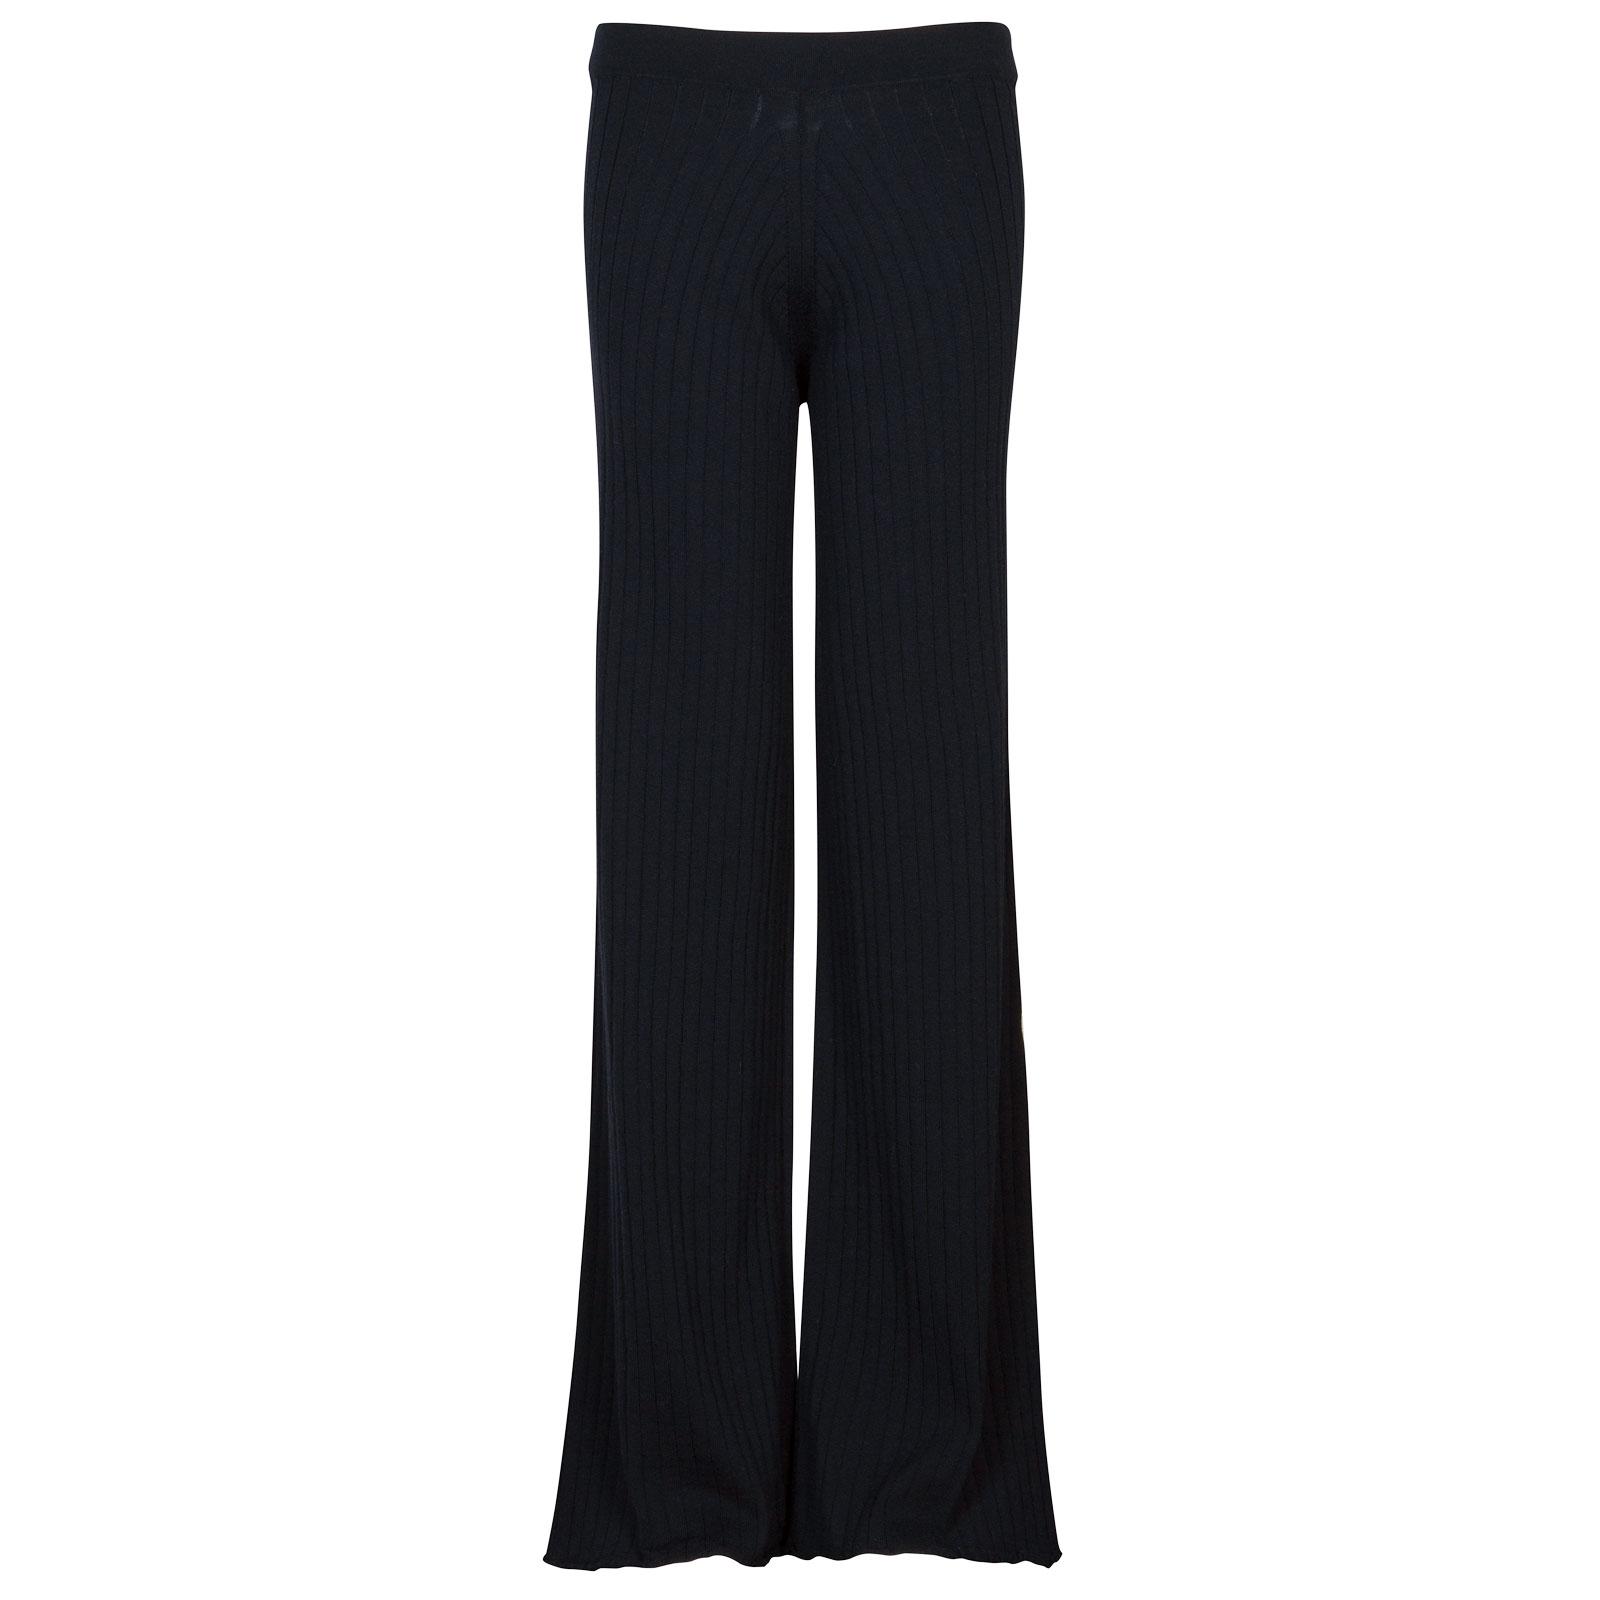 John Smedley joanie Merino Wool Trouser in Midnight-XL